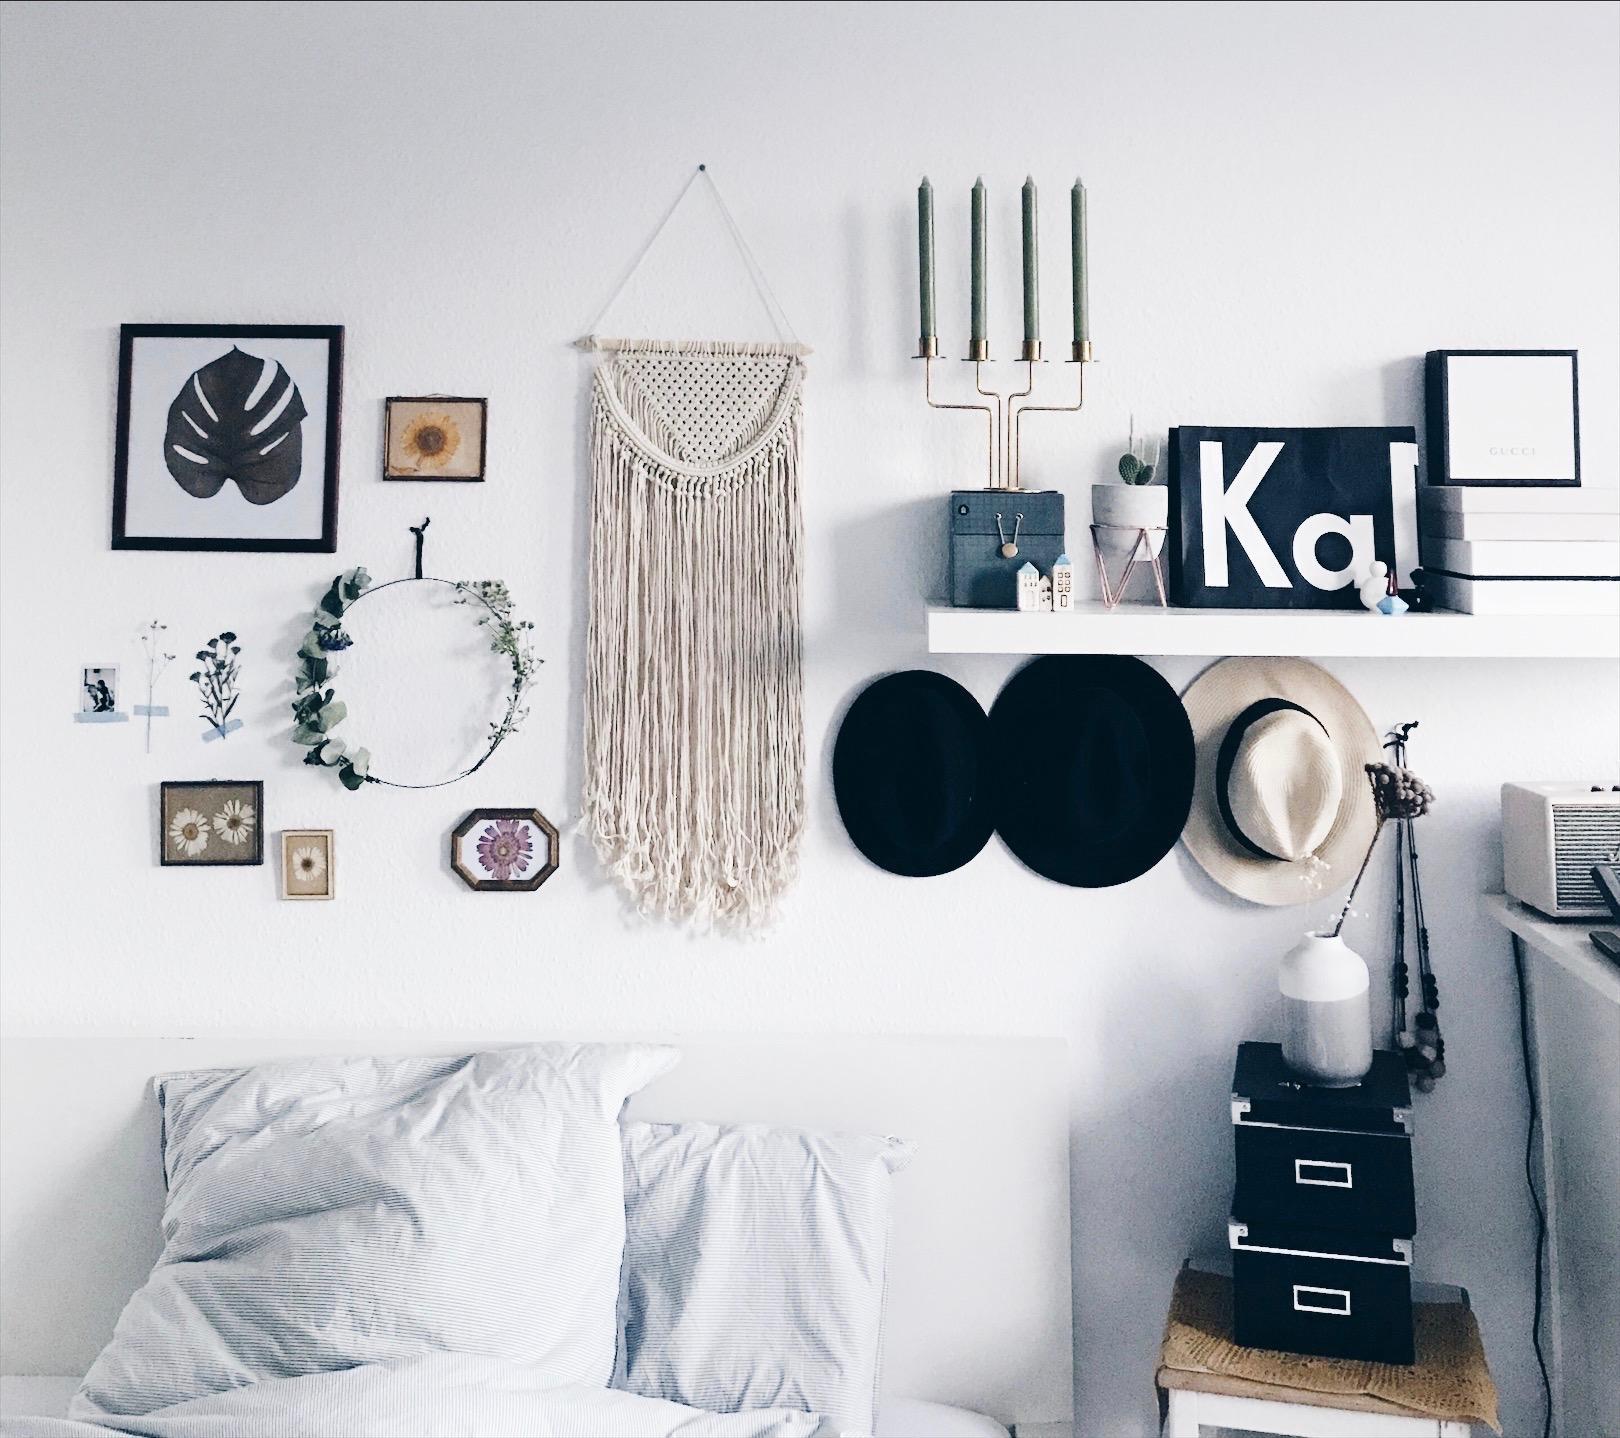 Full Size of Schlafzimmer Wanddekoration Wanddeko Ideen Ikea Holz Selber Machen Amazon Bedroom Living Cozy Kerz Massivholz Lampen Komplett Weiß Romantische Tapeten Wohnzimmer Schlafzimmer Wanddeko